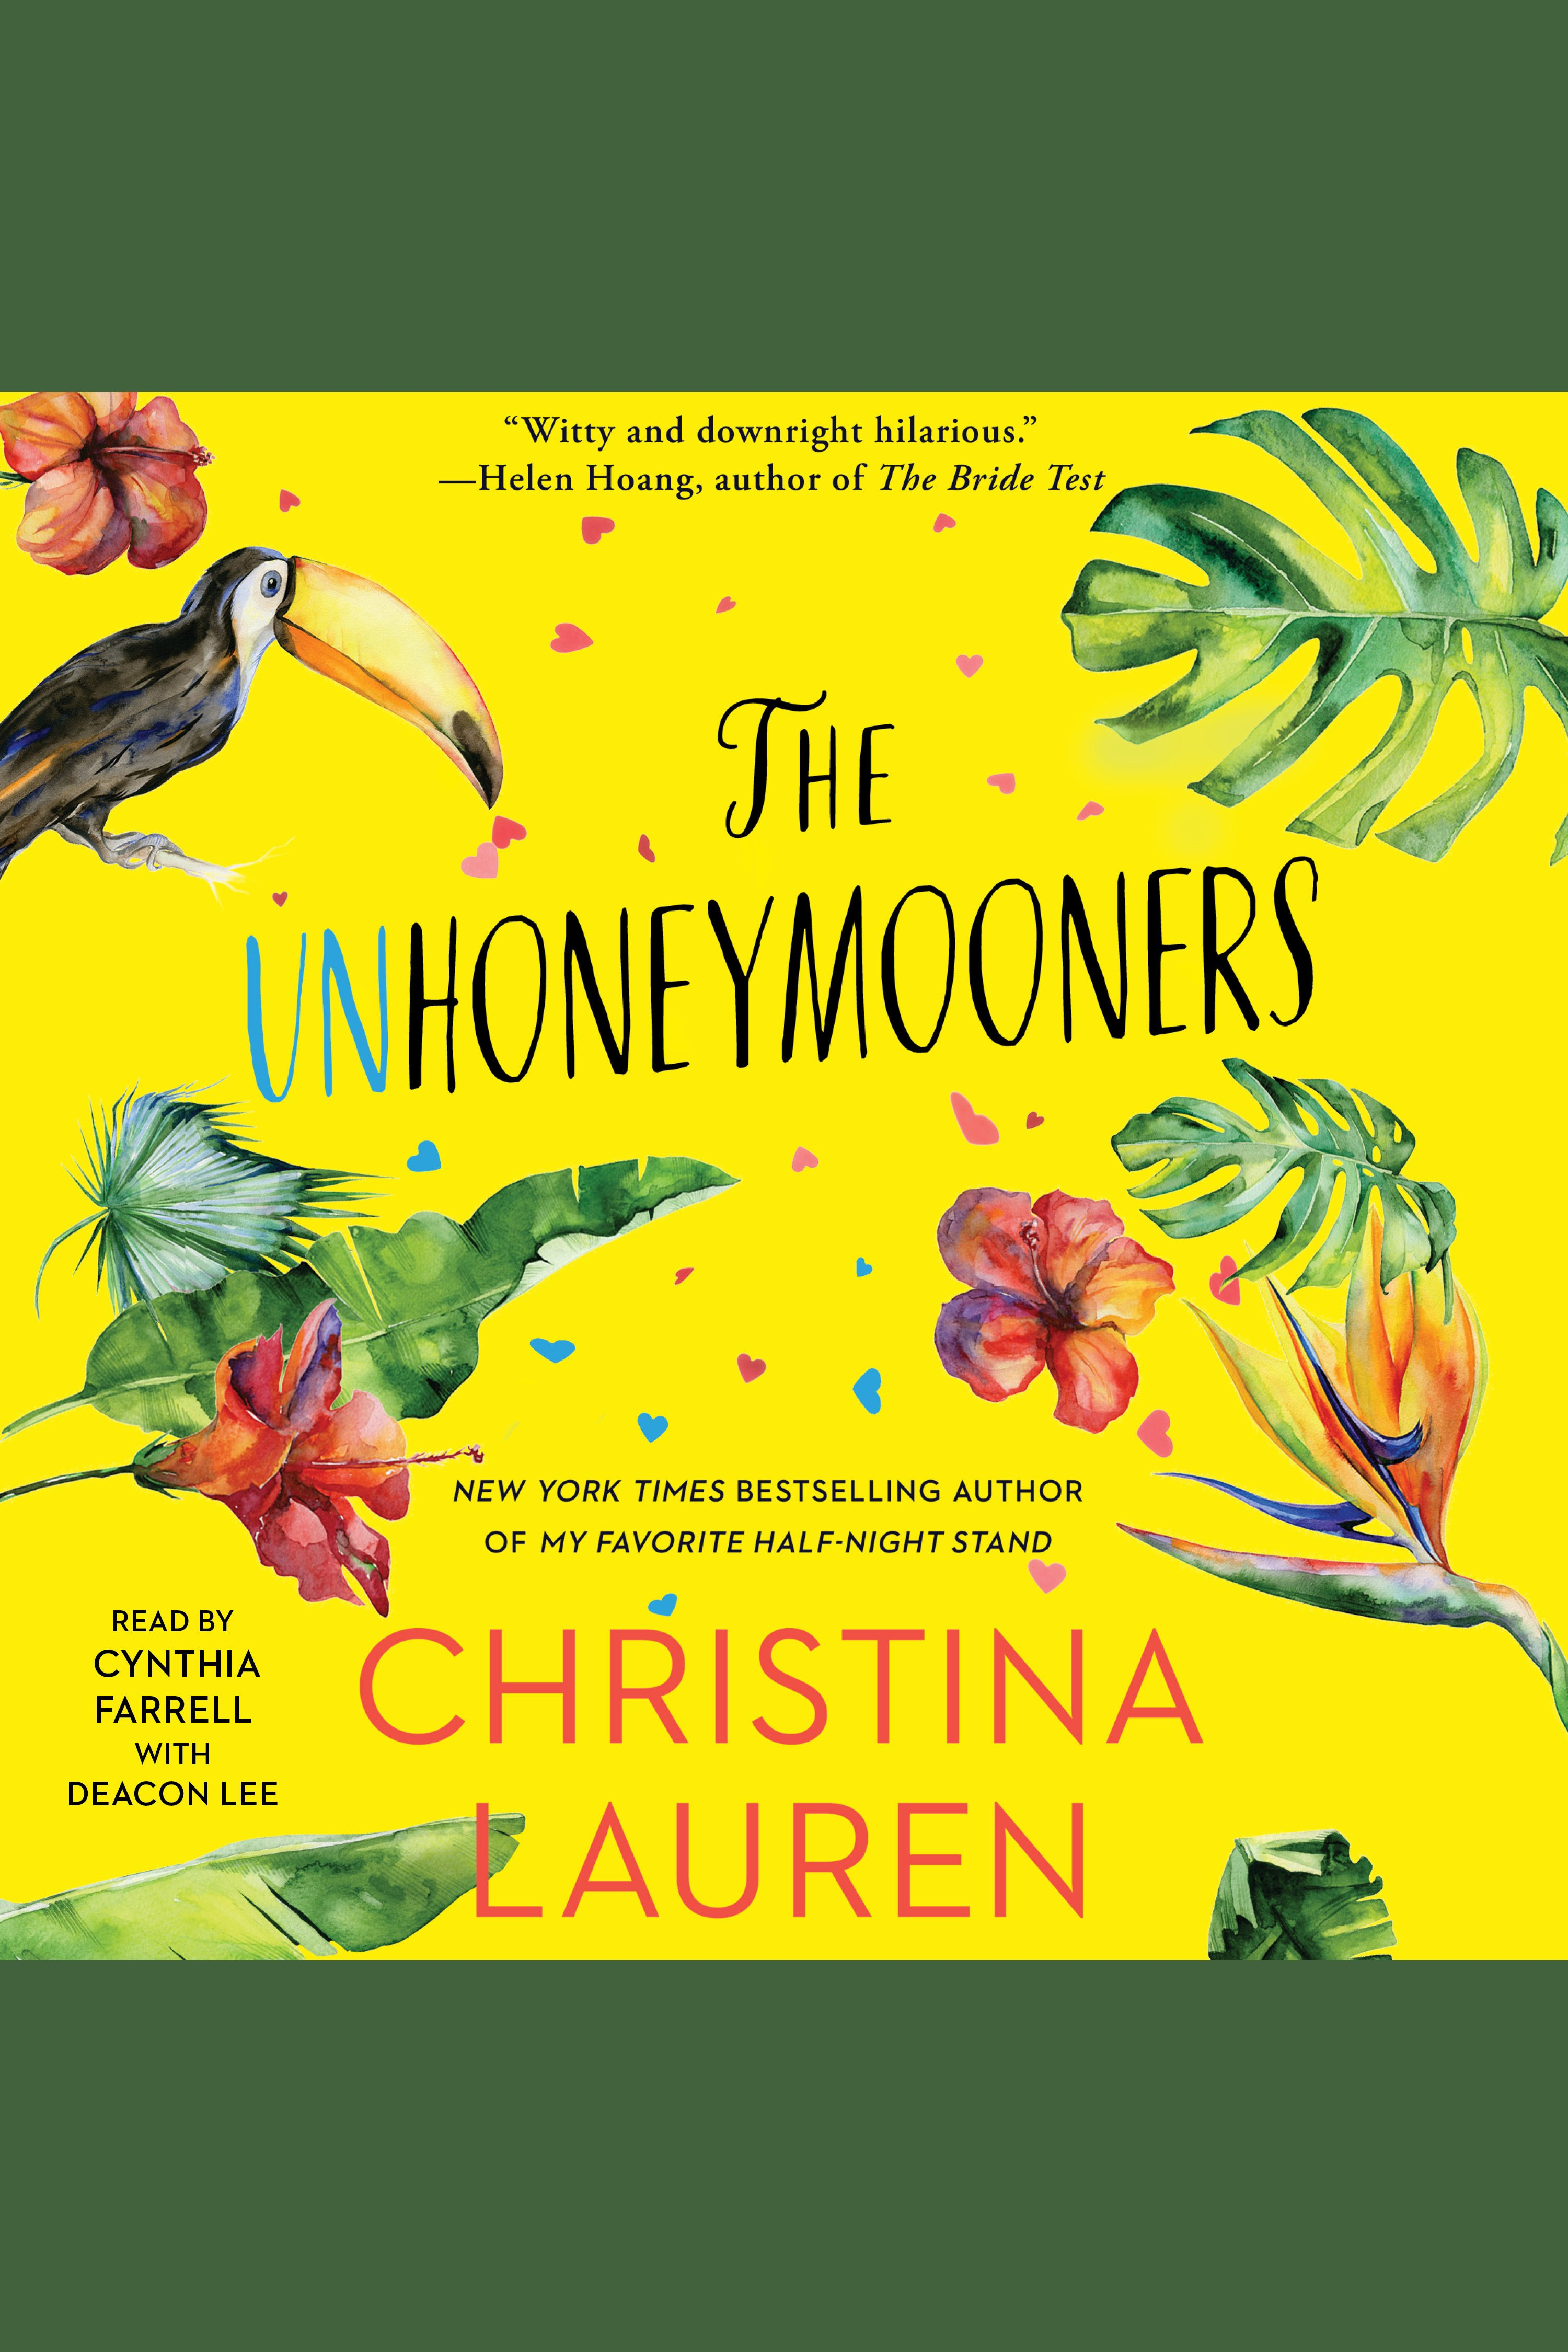 The unhoneymooners cover image